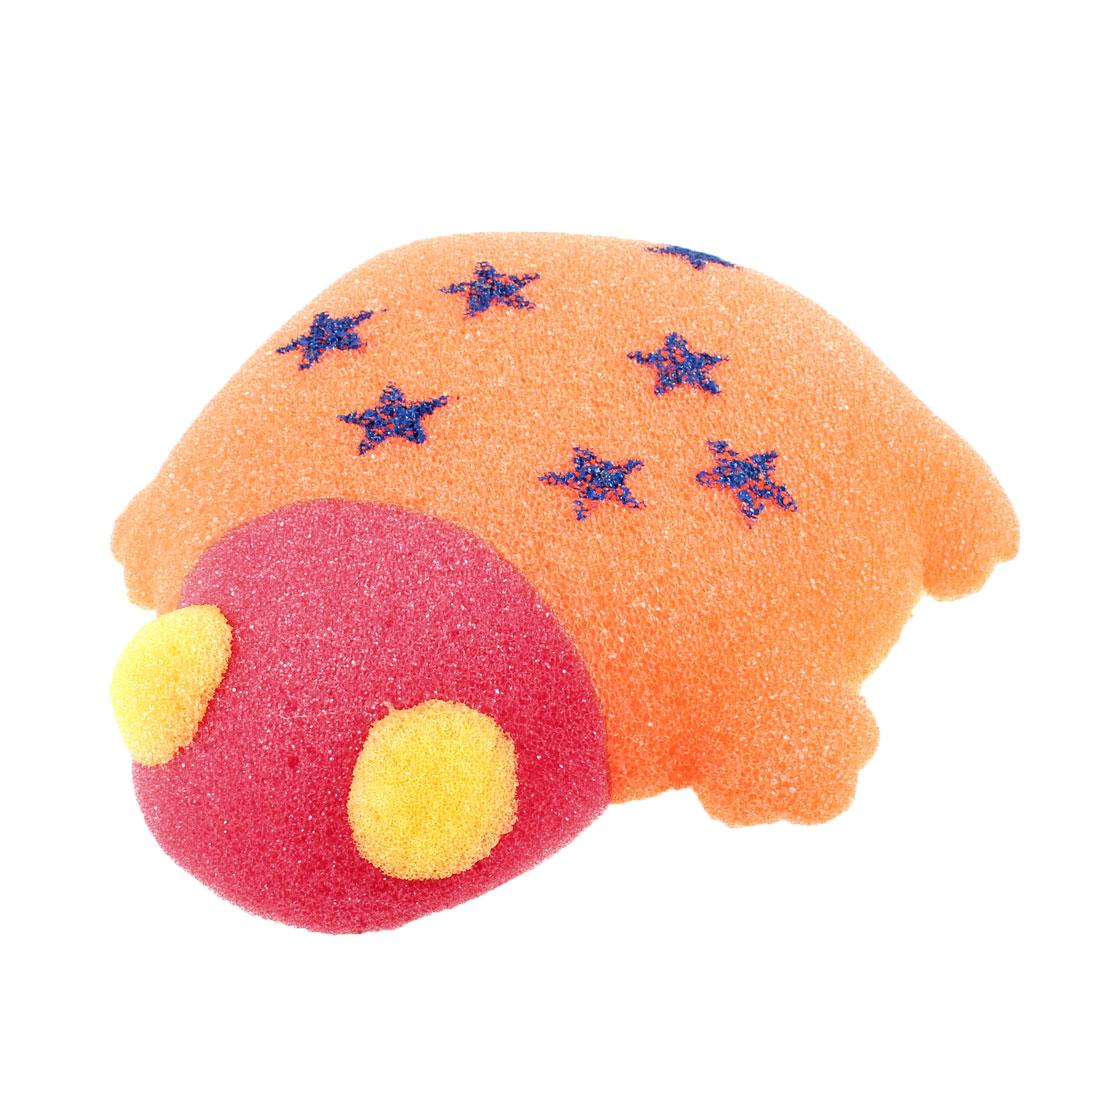 Bathroom Body Care Frog Shape Sponge Bath Shower Orange Red Yellow